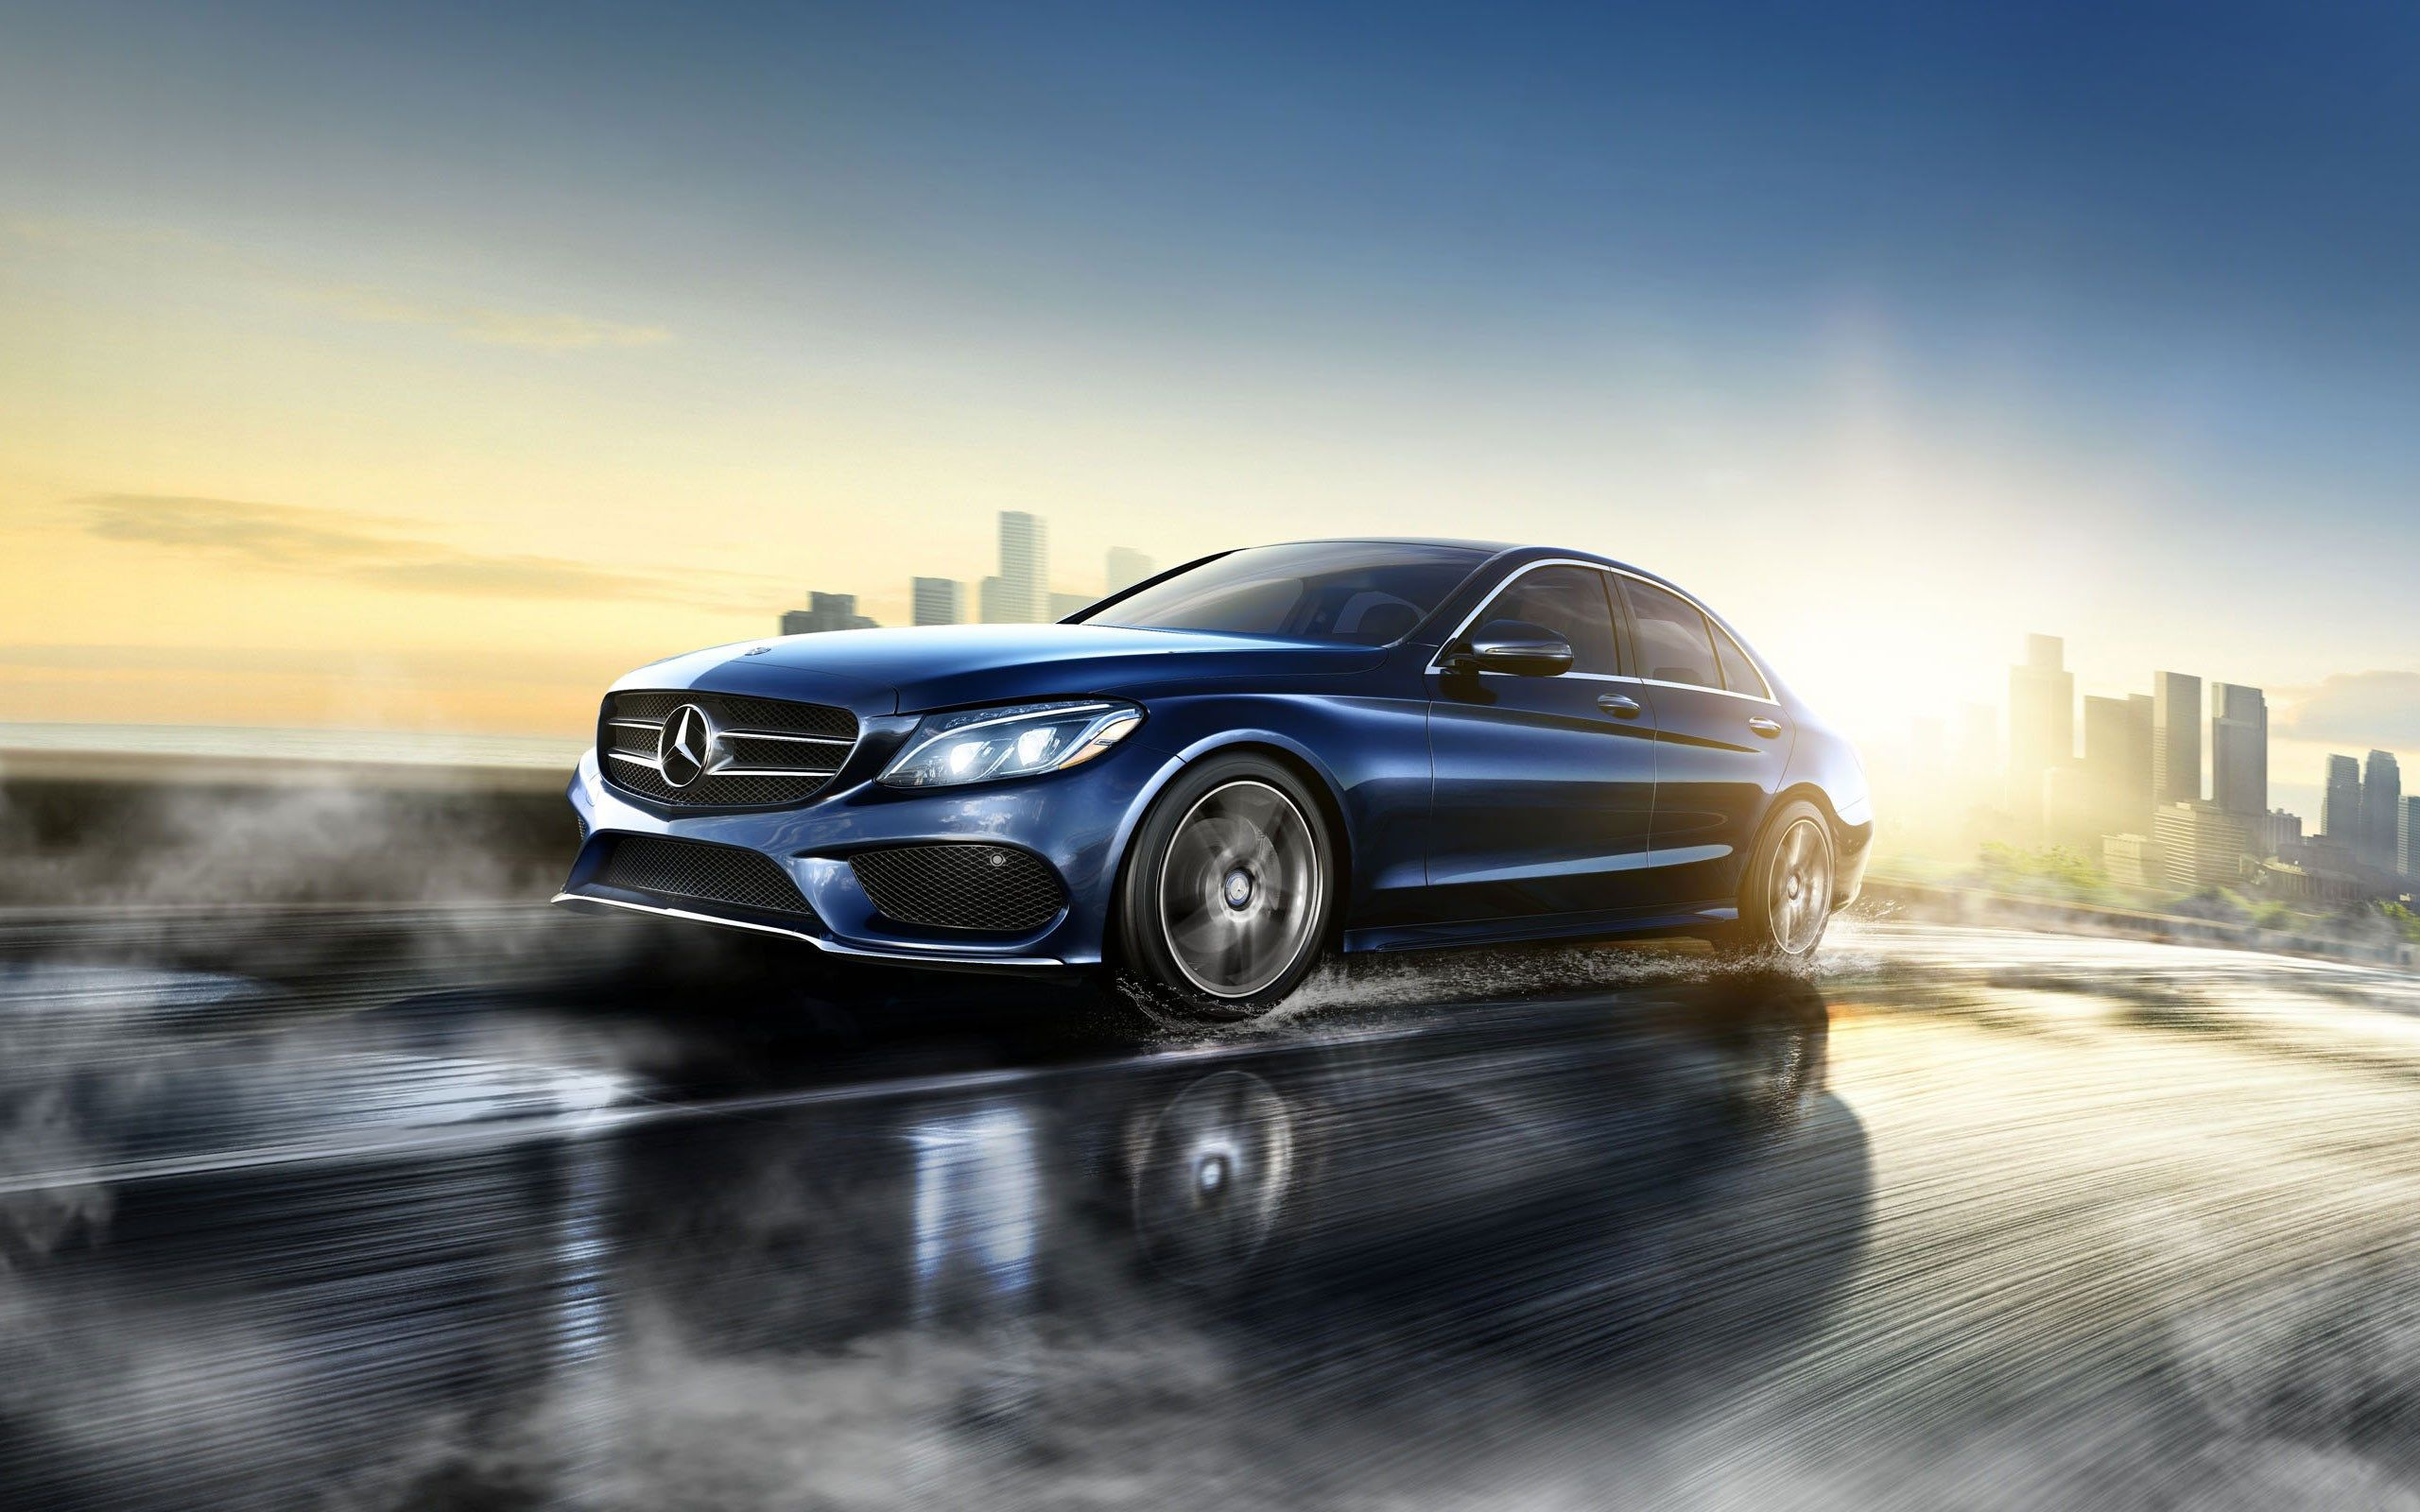 Mercedes-Benz C300 AMG